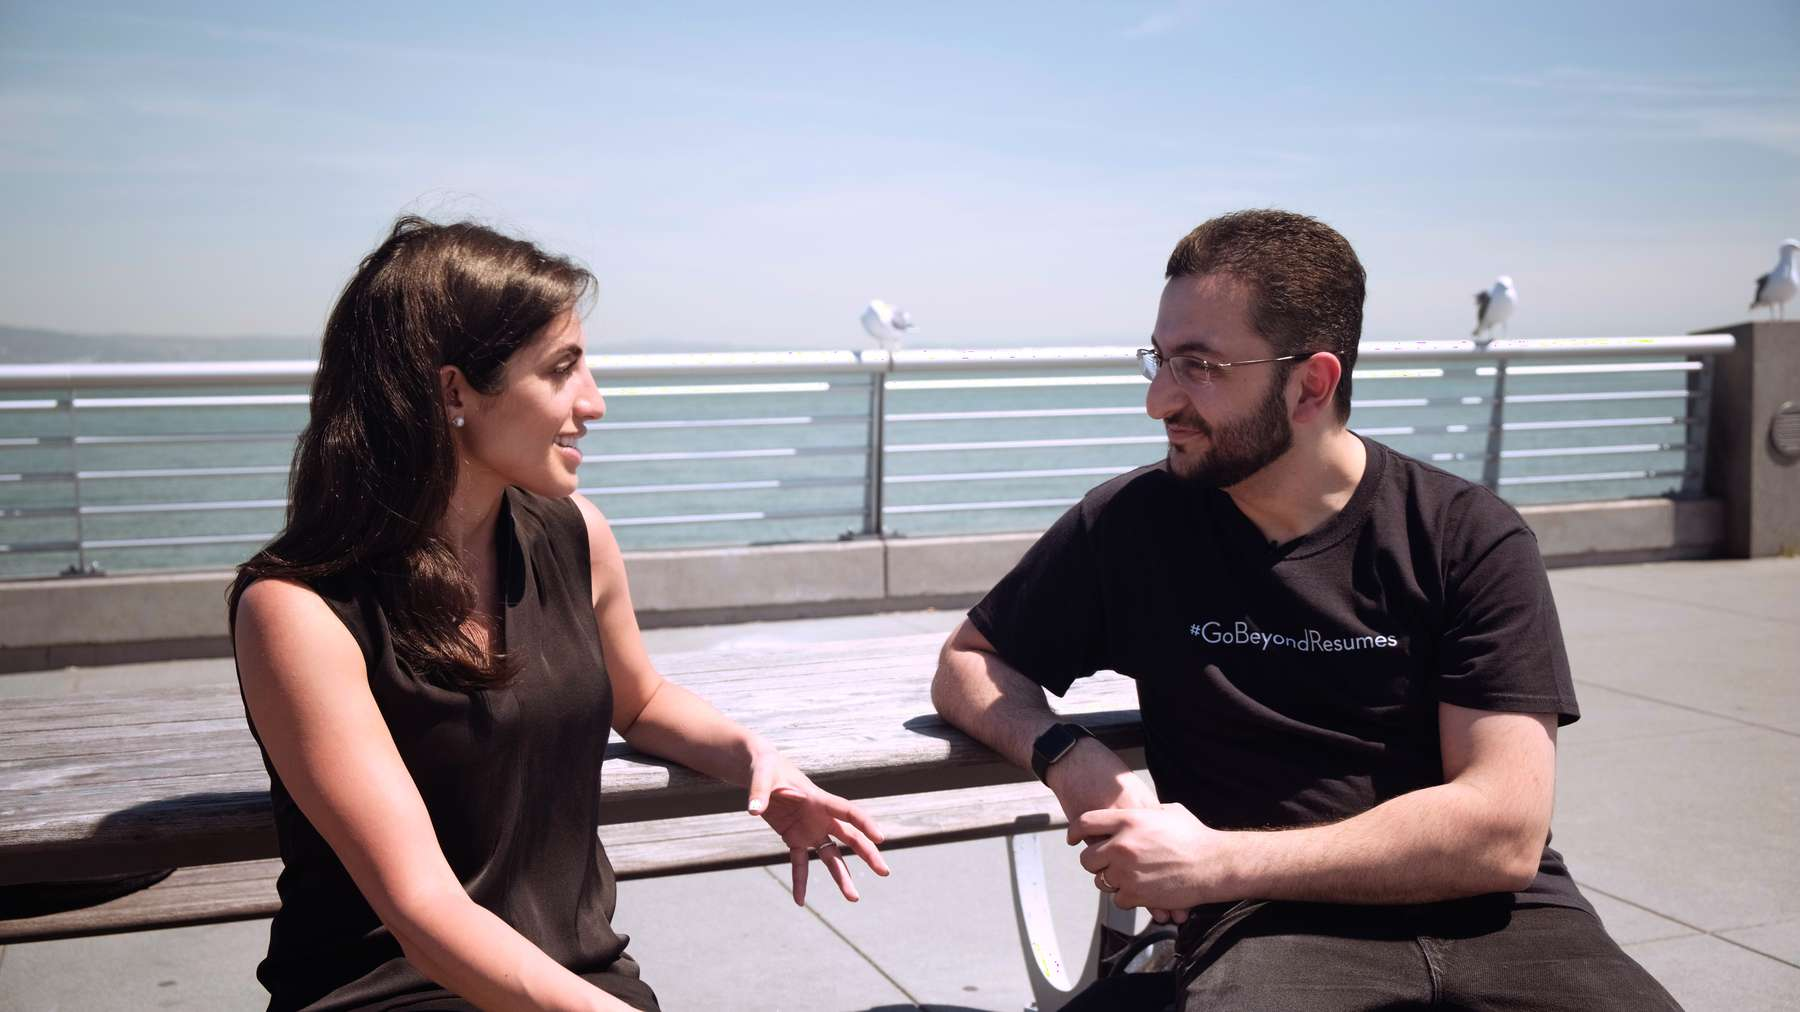 Index Ventures Partner Nina Achadjian (left) with CodeSignal CEO and co-founder Tigran Sloyan (right)